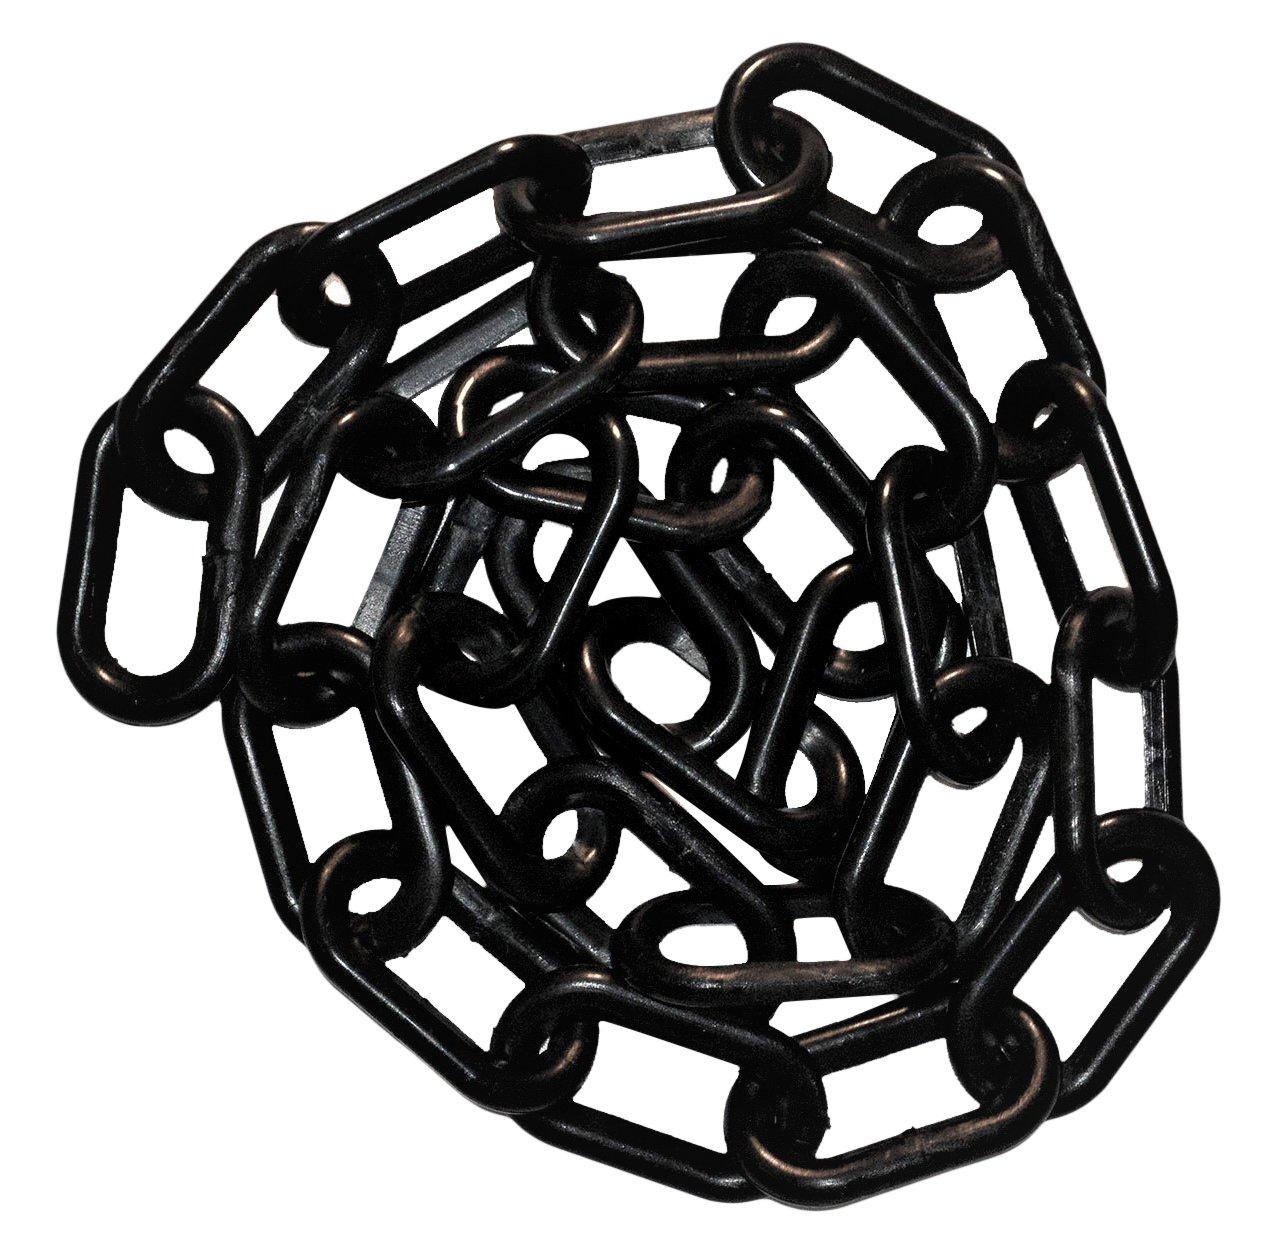 Mr. Chain 50003-25 Plastic Barrier Chain, High Density Polyethylene with UV Inhibitors, 2'' Link x  25', Black